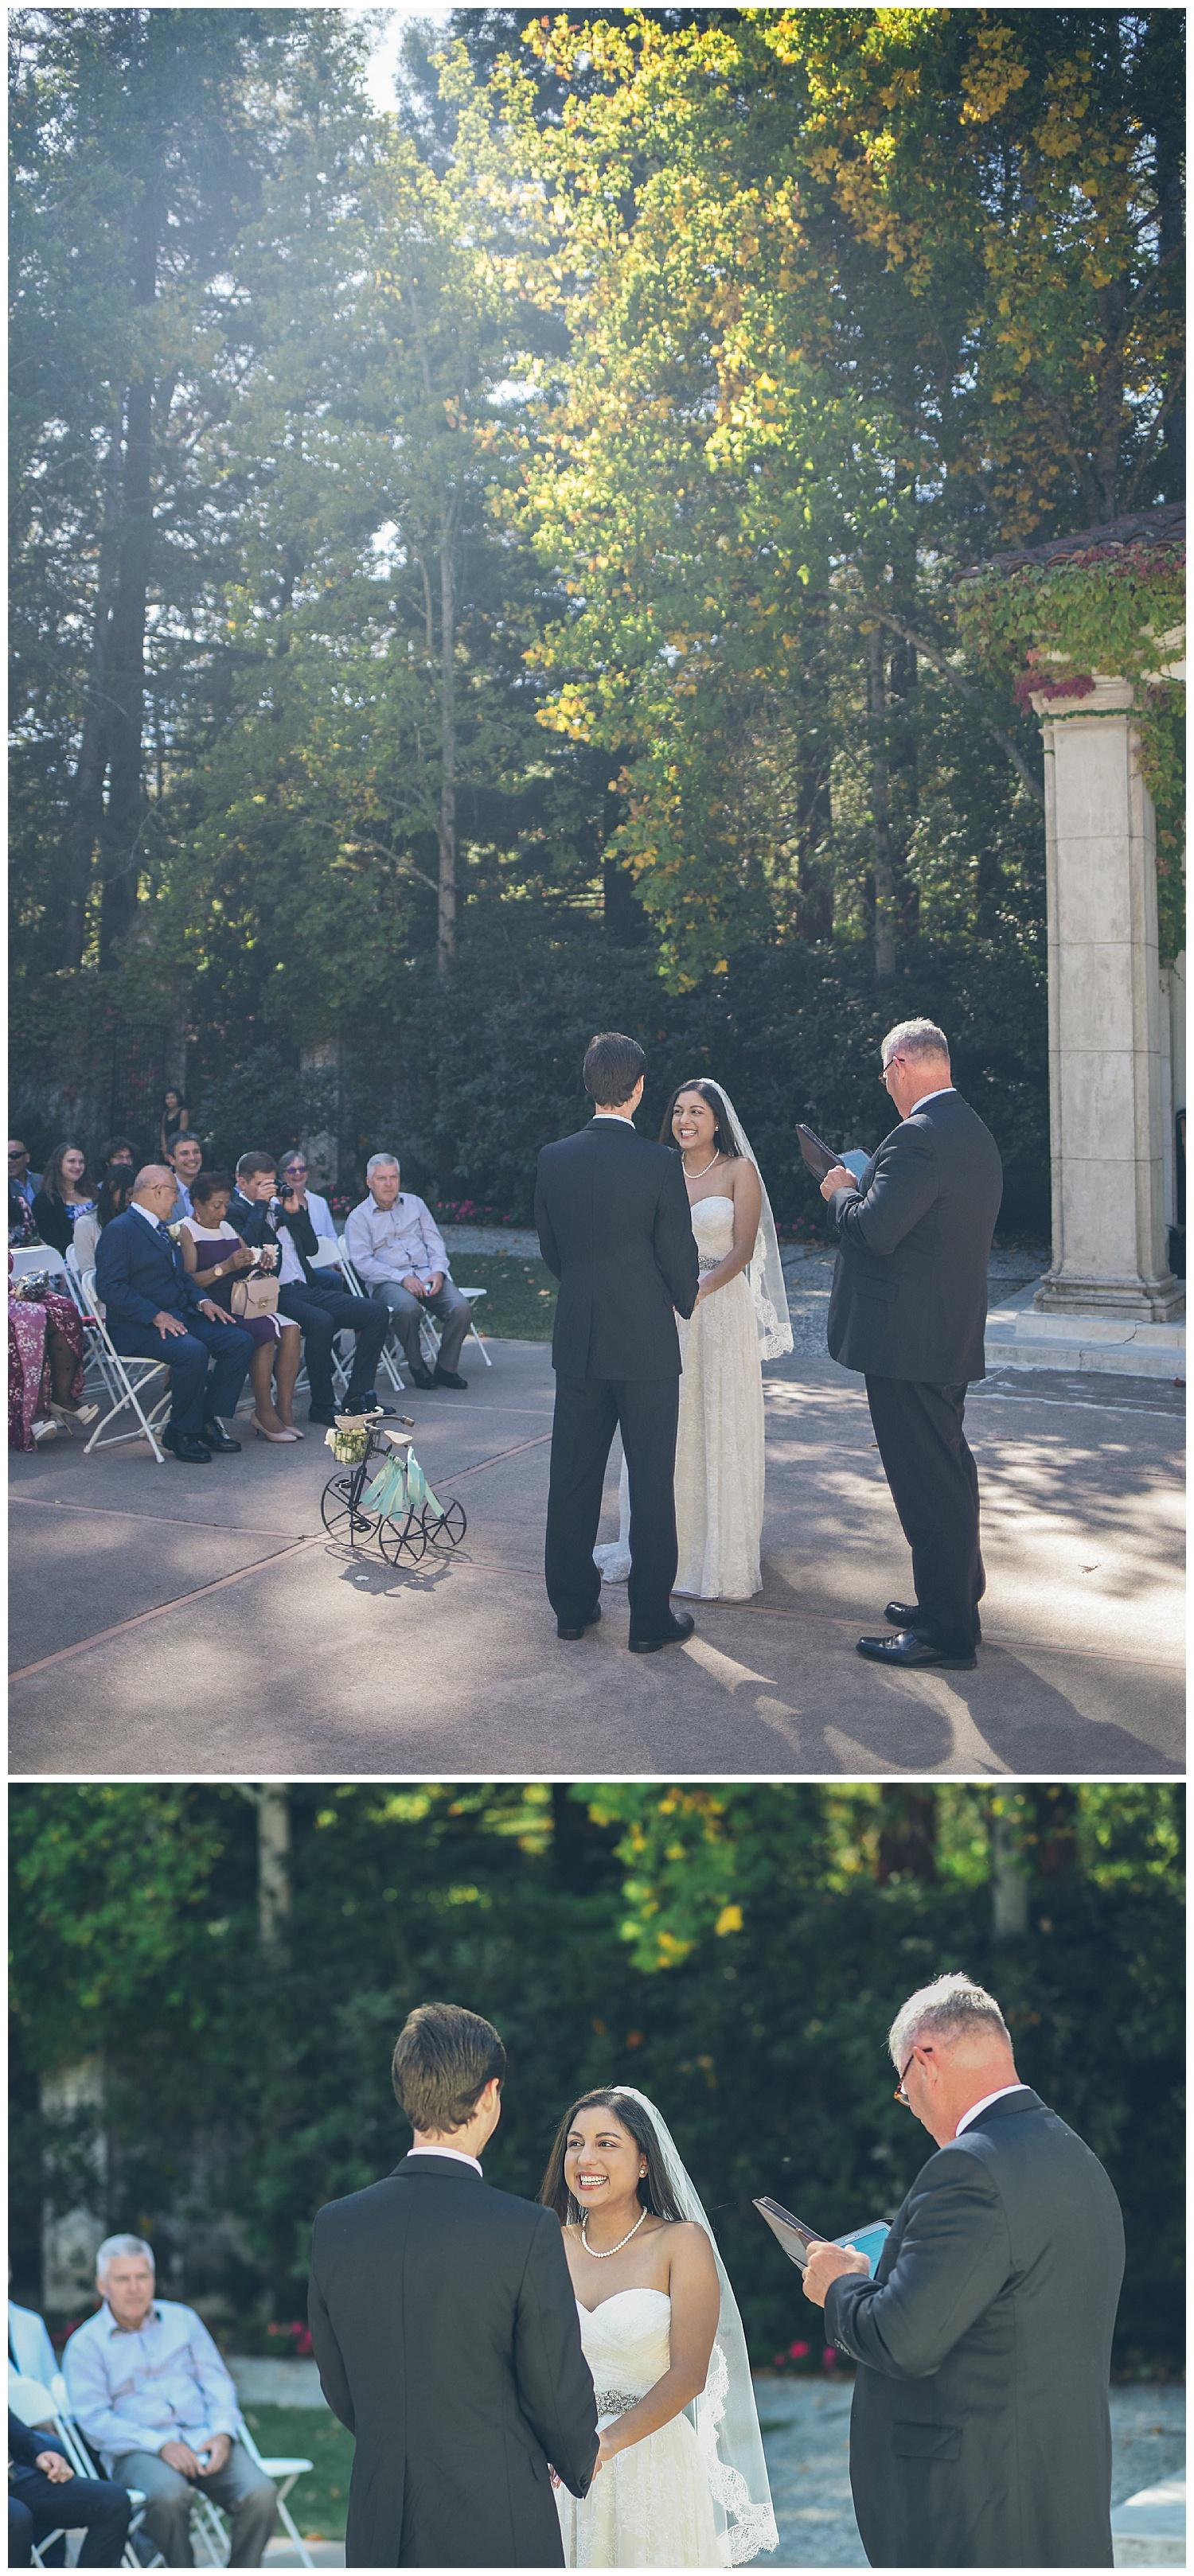 khariza-rae-photography-bay-area-wedding-photographer_0136.jpg